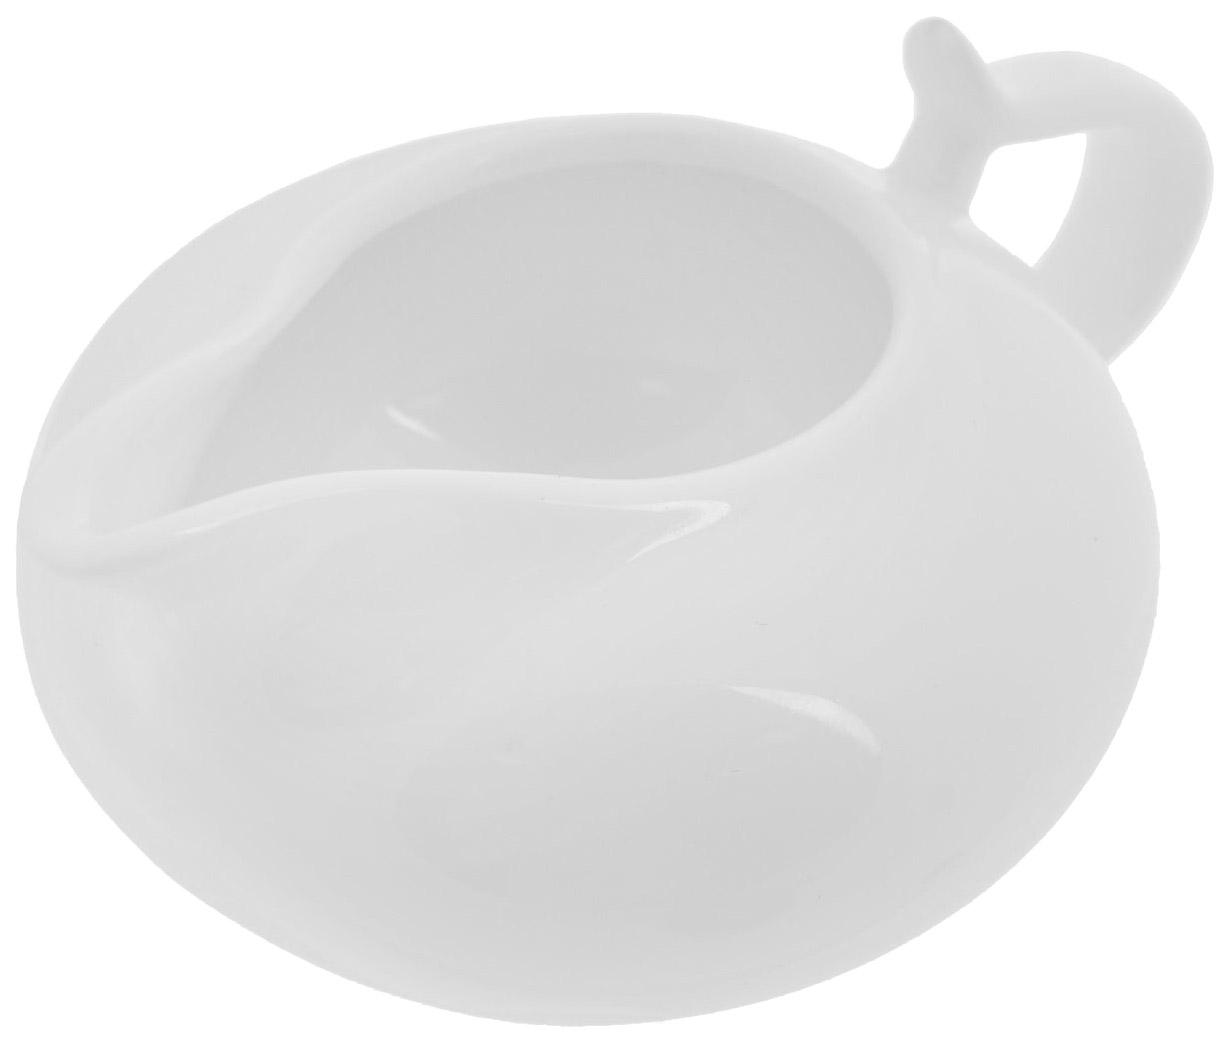 Молочник белый WILMAX WL-995022 / 1C